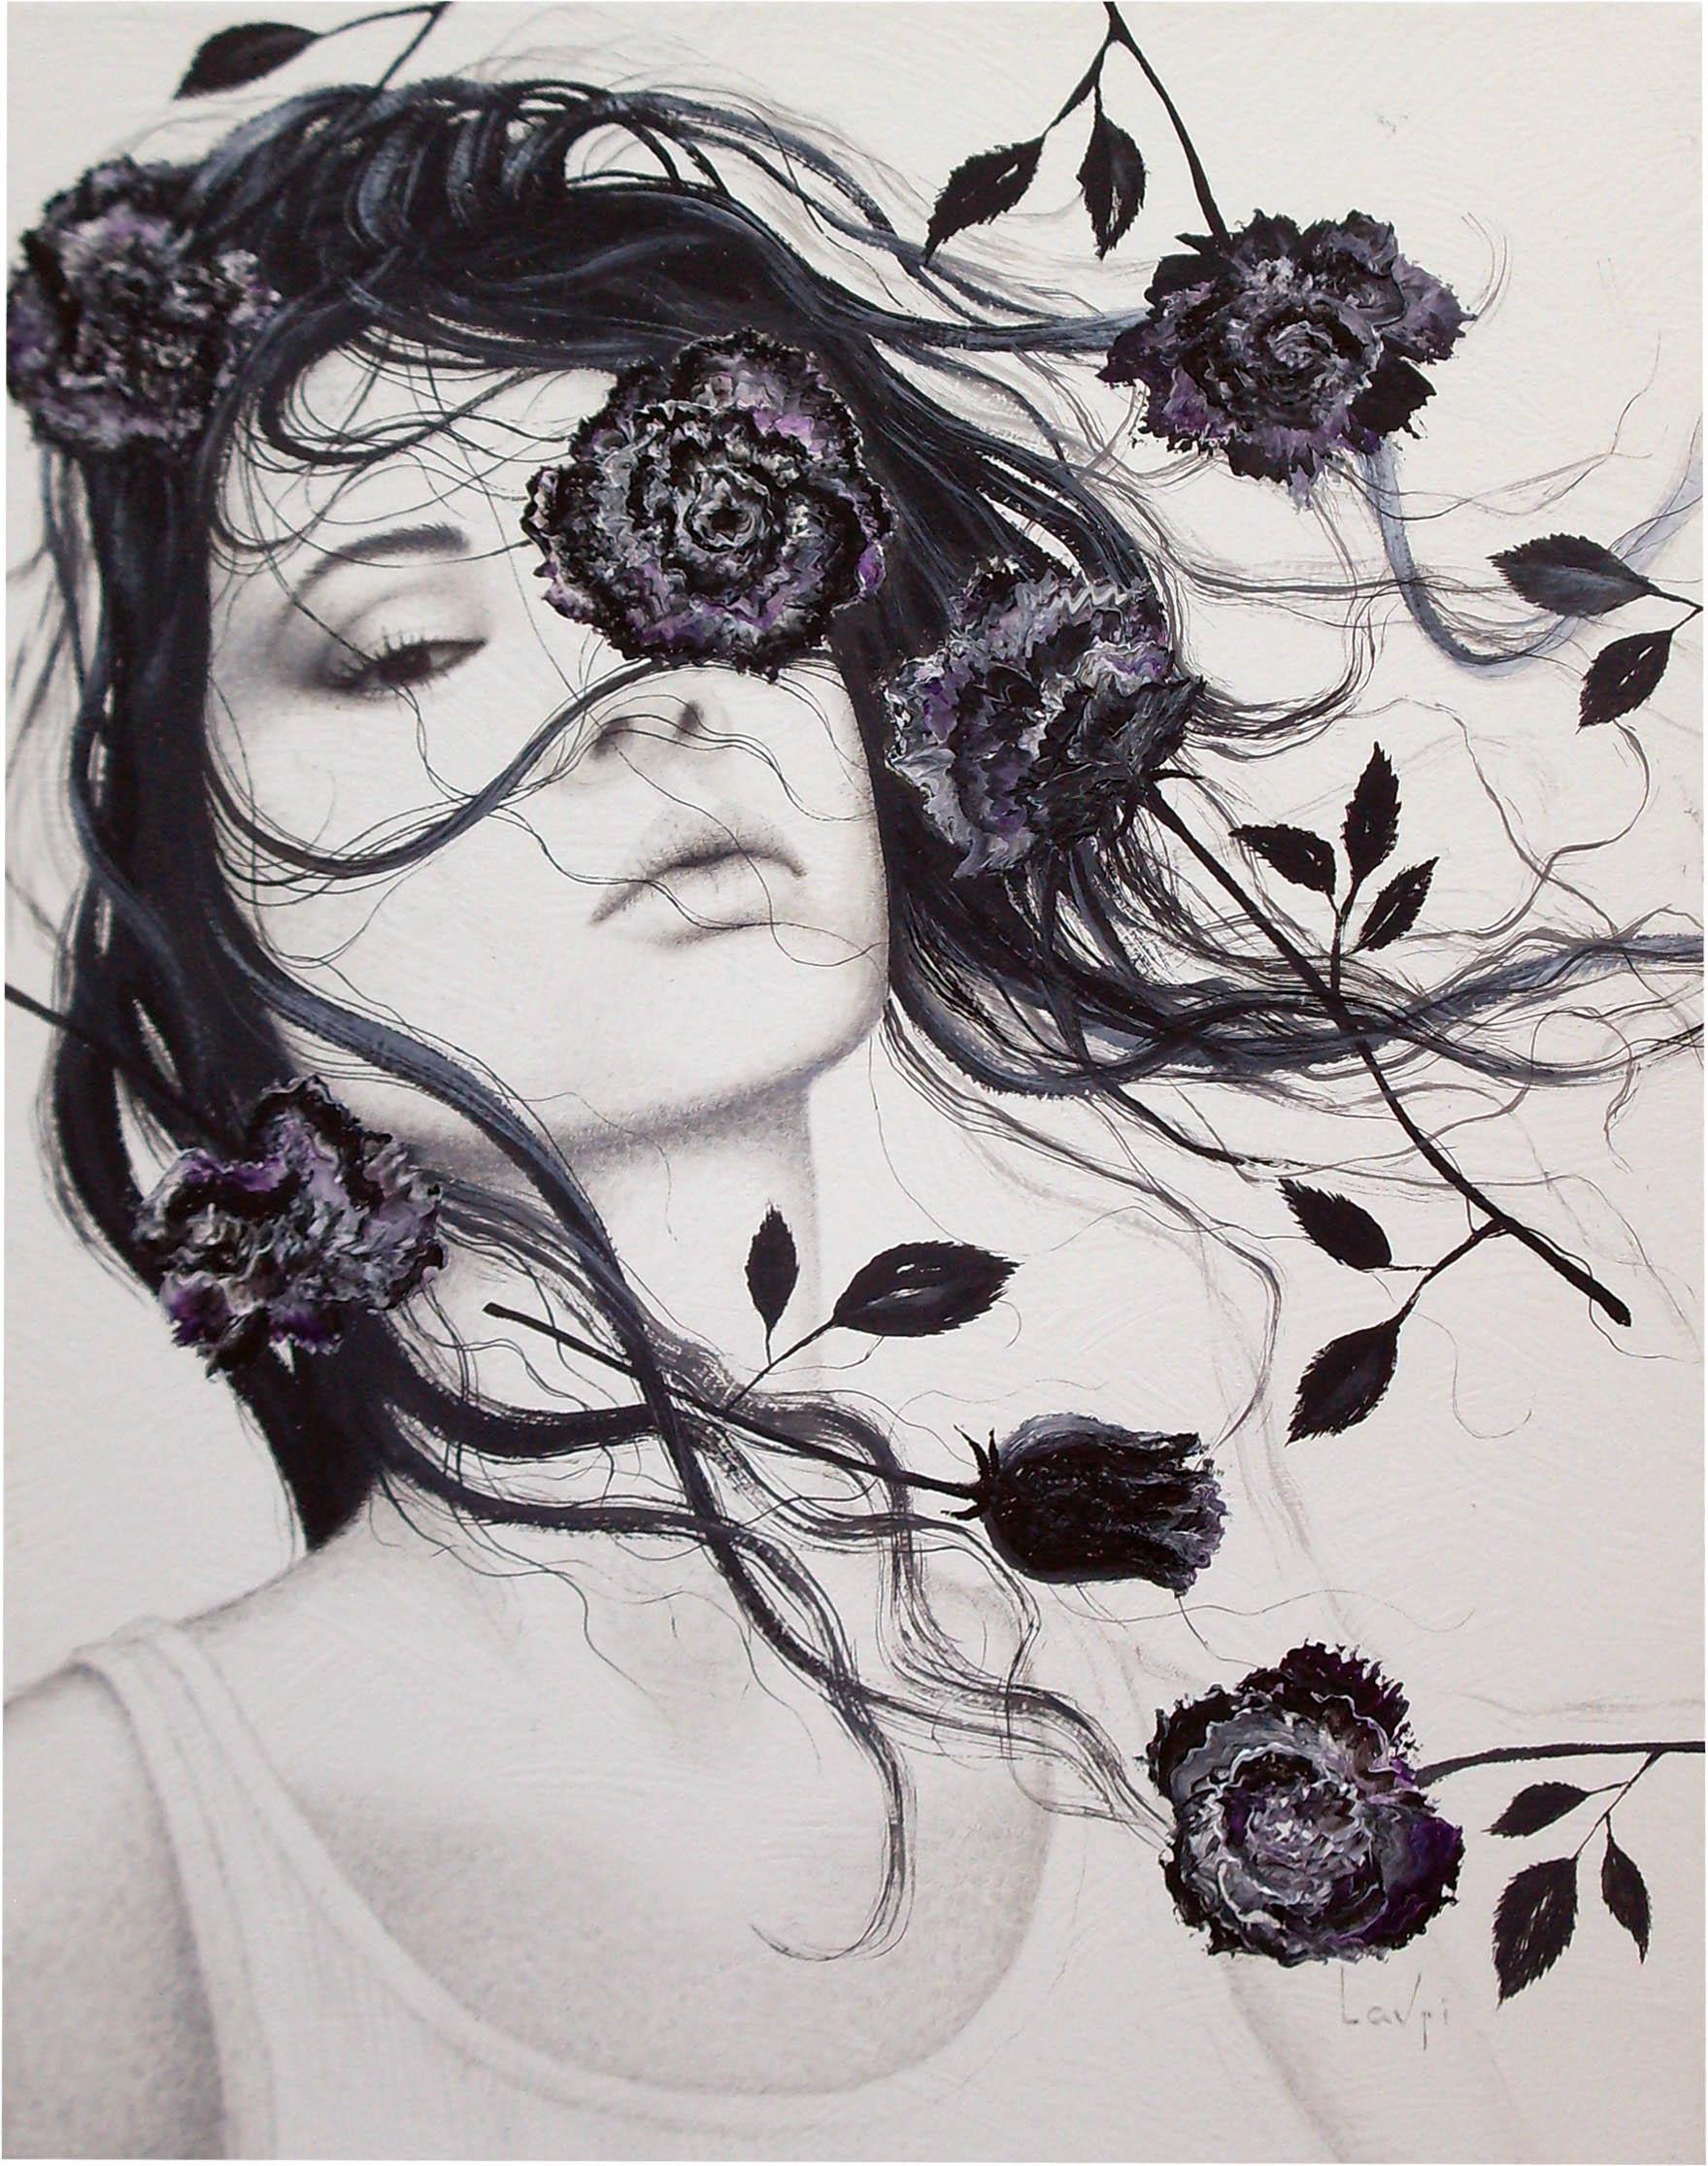 Black Rose, 2019